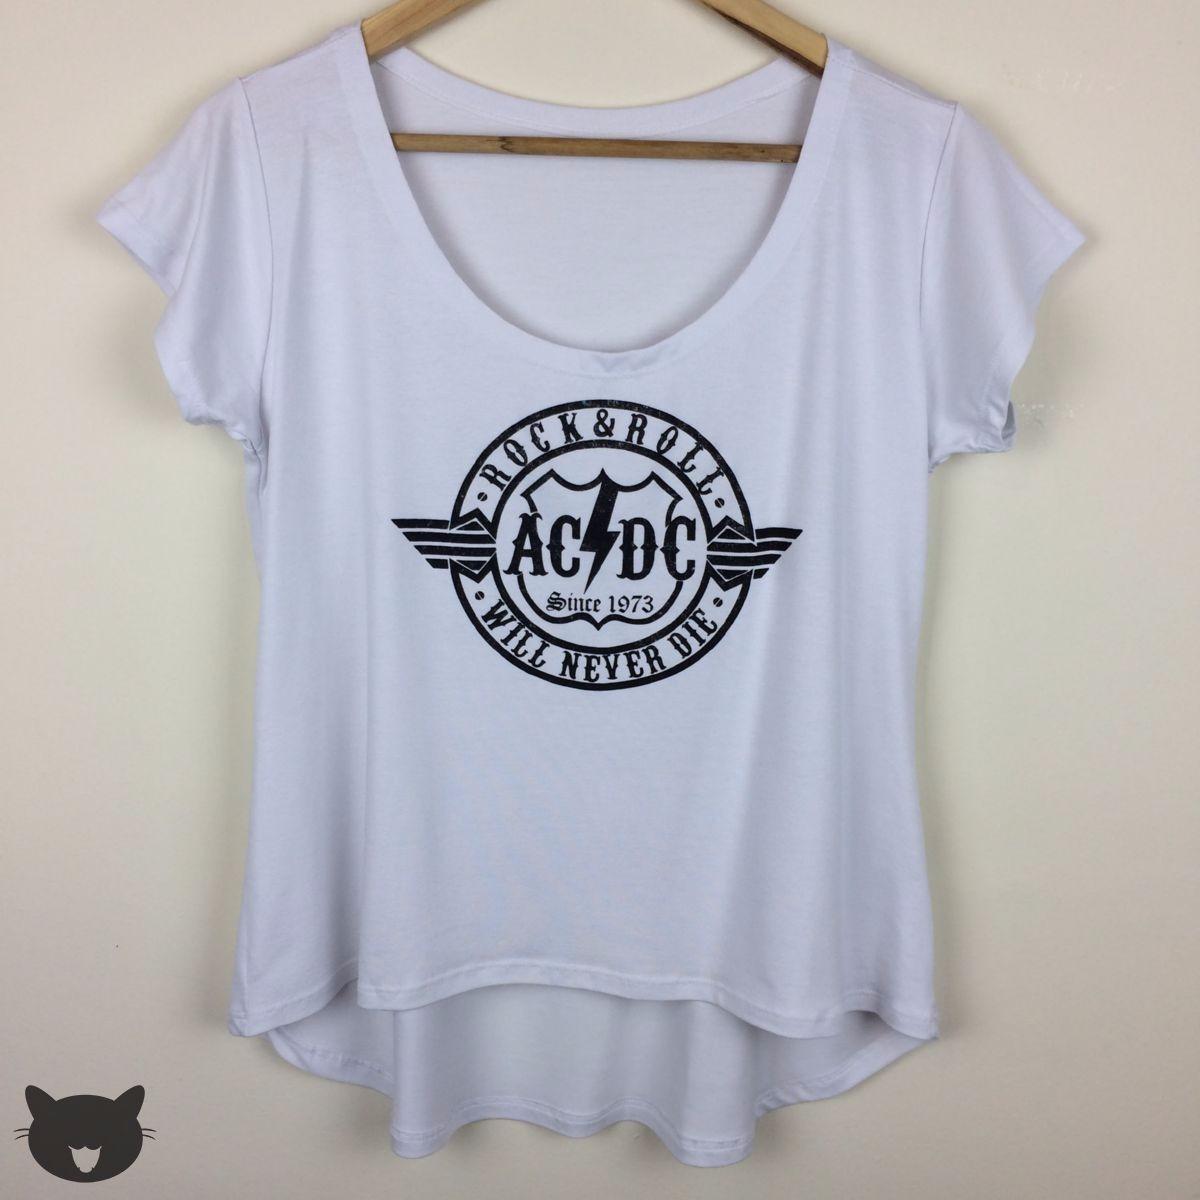 c7132cdda9 T-shirt Camiseta Blusa Feminina Mullet Rock Roll Old Acdc Ok - R  19 ...